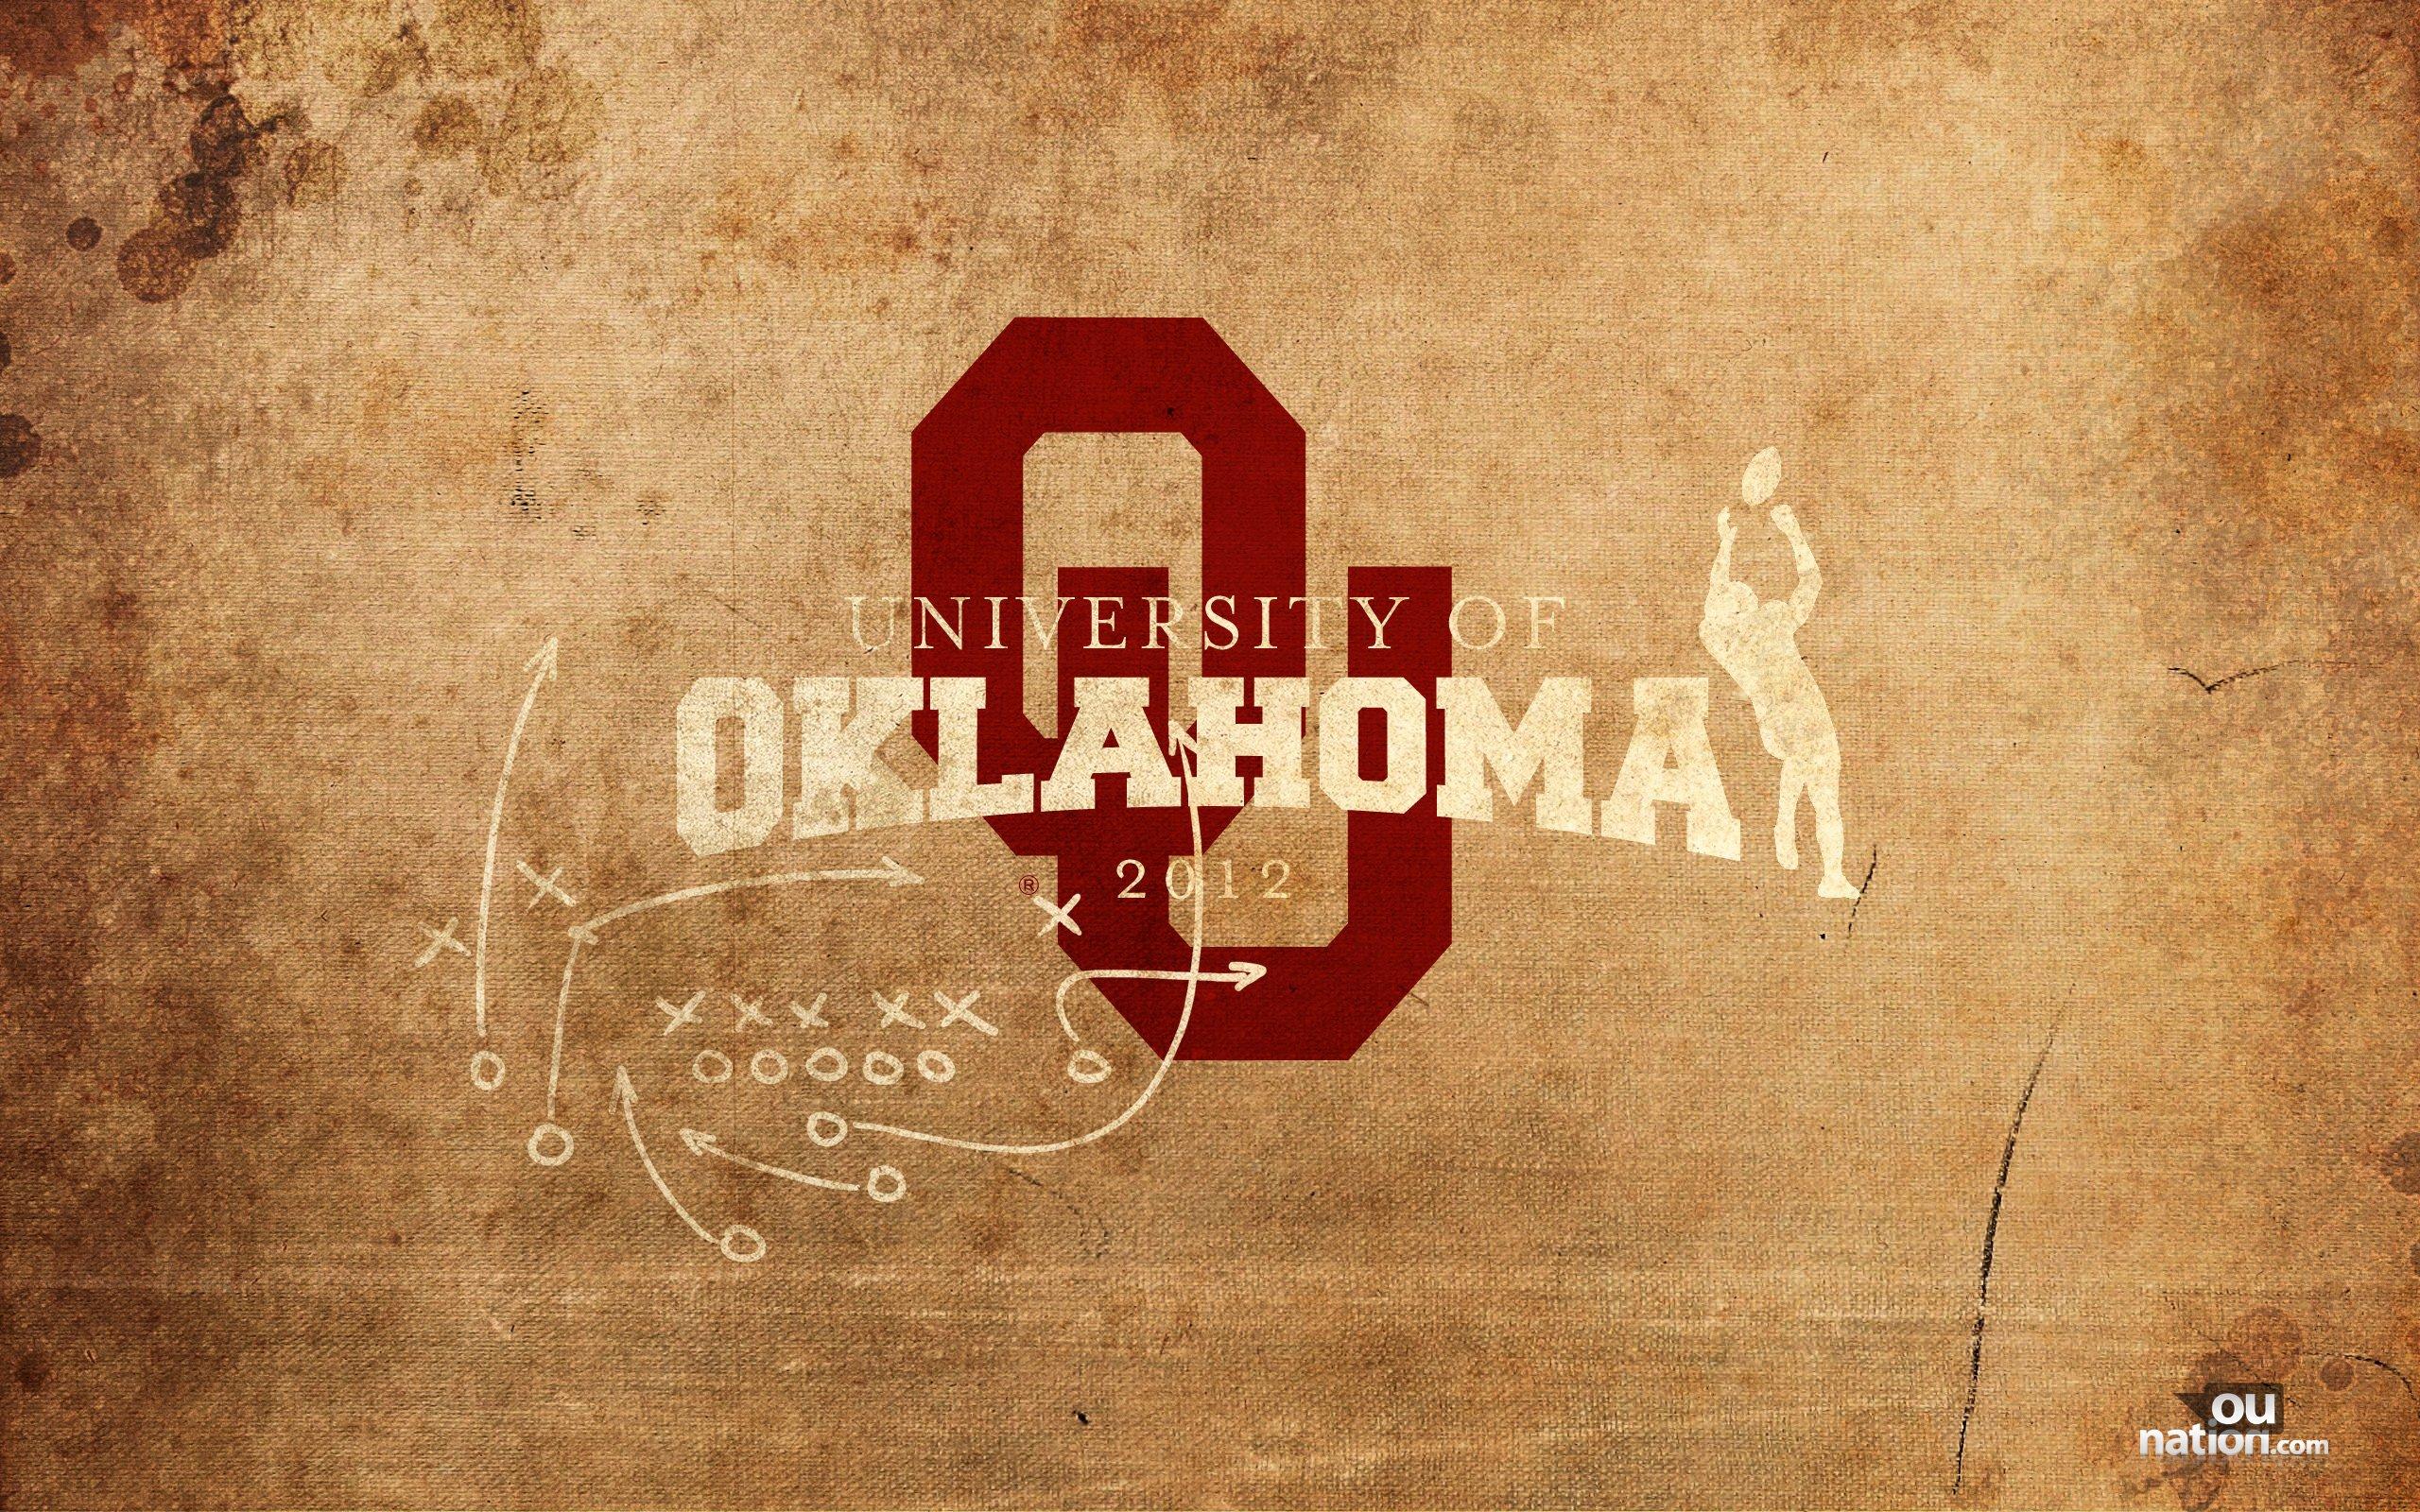 OKLAHOMA SOONERS college football wallpaper 2560x1600 594074 2560x1600